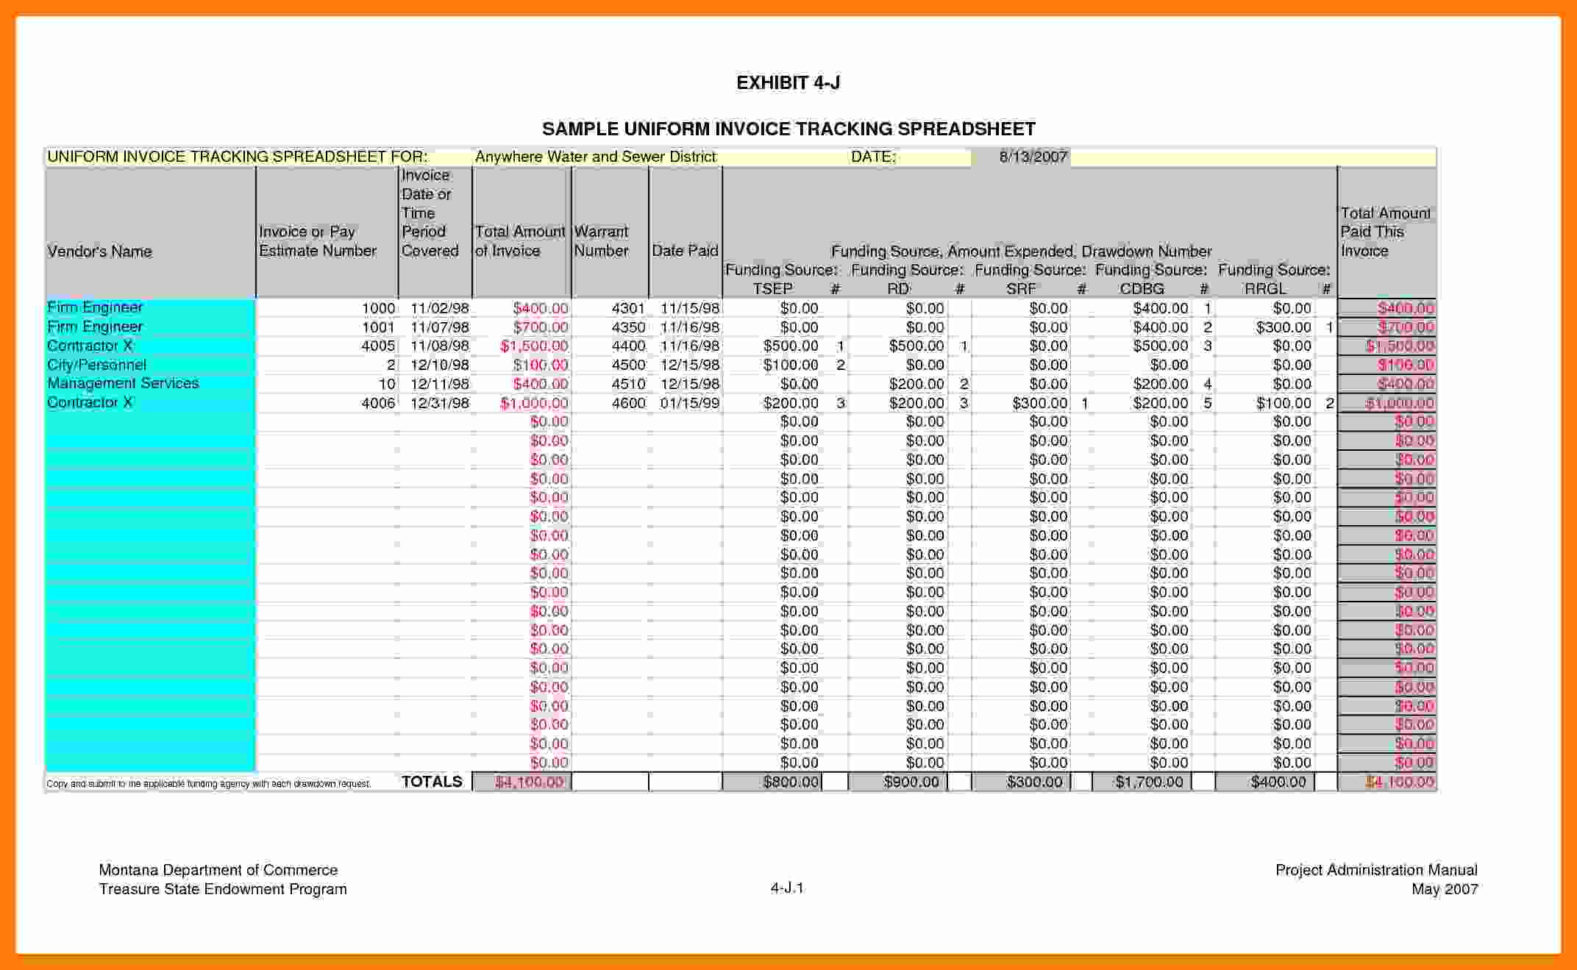 Order Tracking Spreadsheet Template Regarding Purchase Order Template Excel Unique 9 Purchase Order Tracking Excel